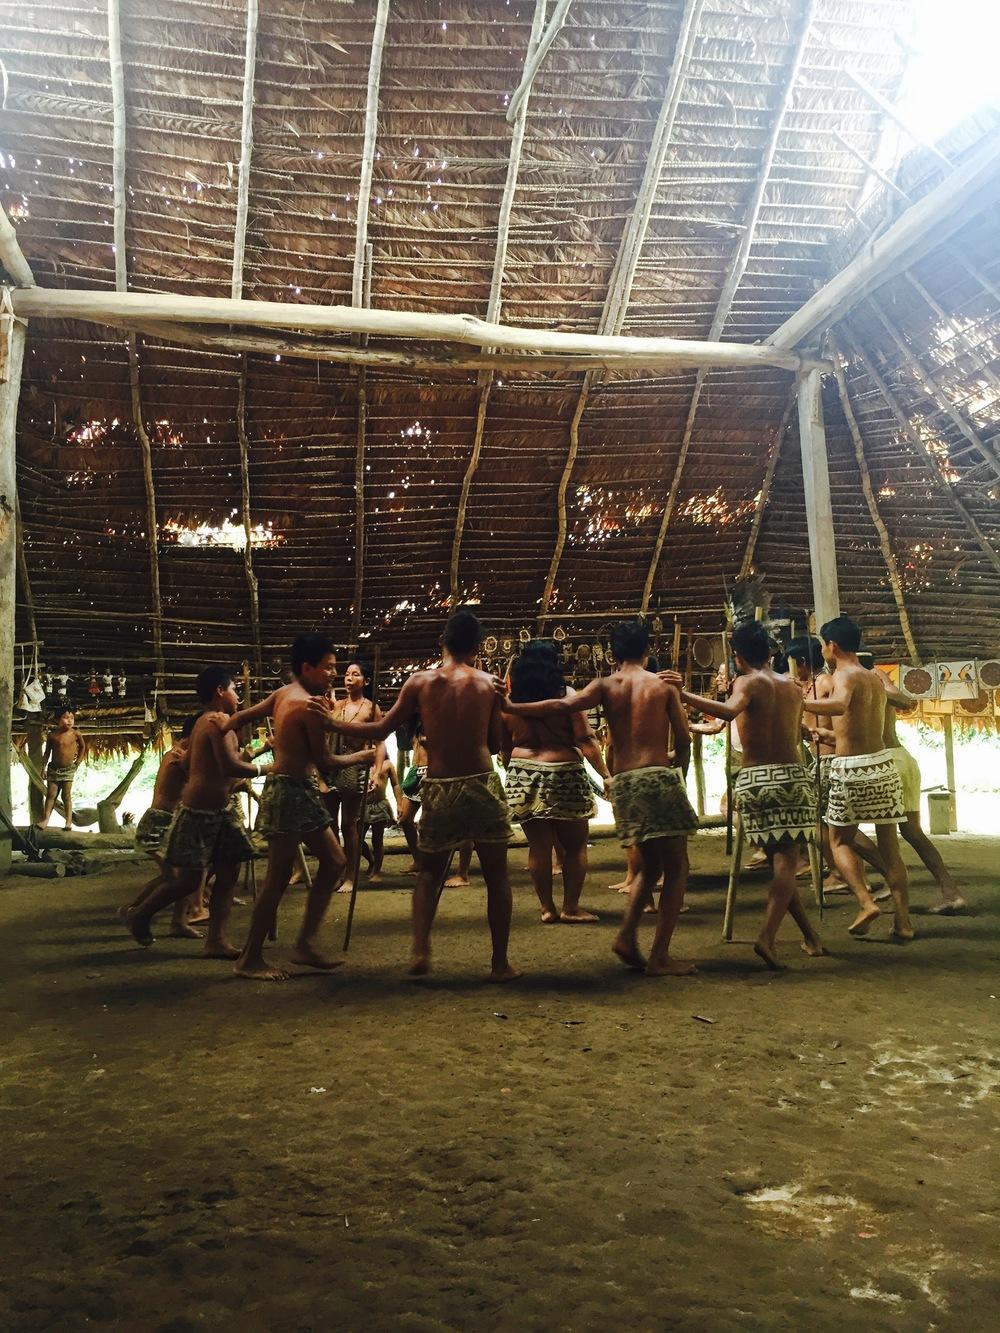 Peru_Amazon_bora bora tribe 2.jpg